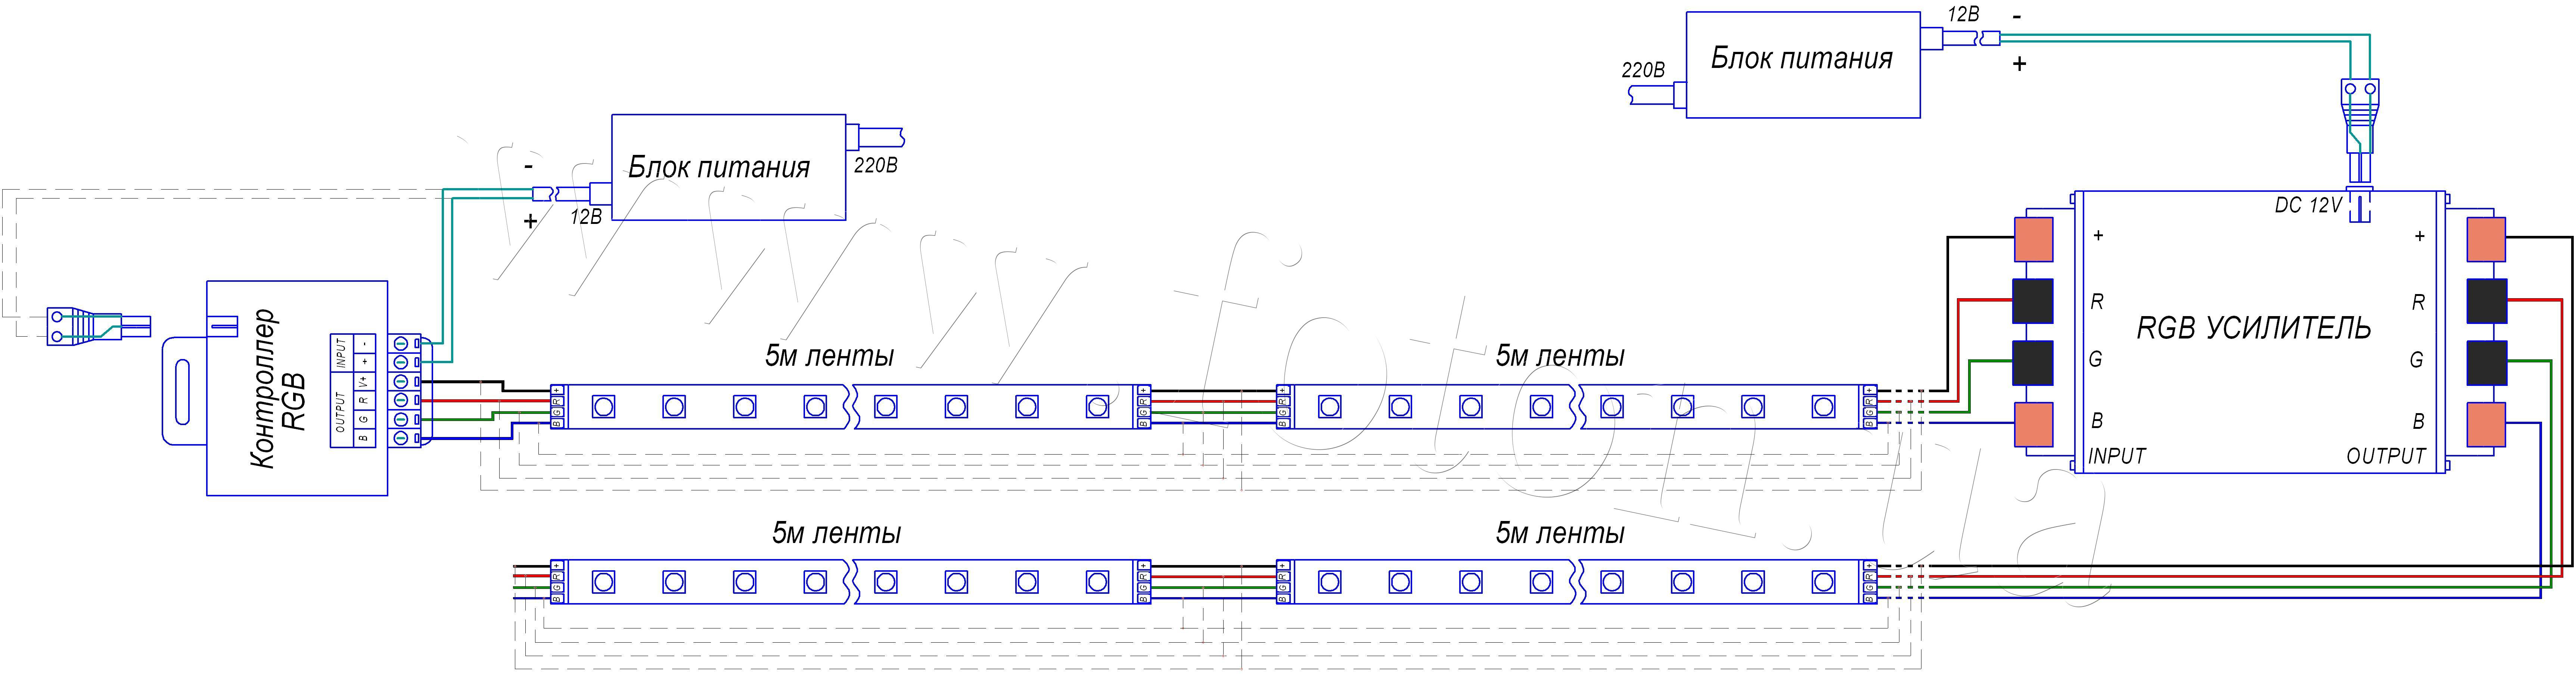 Rgb светодиодная лента схема подключения 15 метров